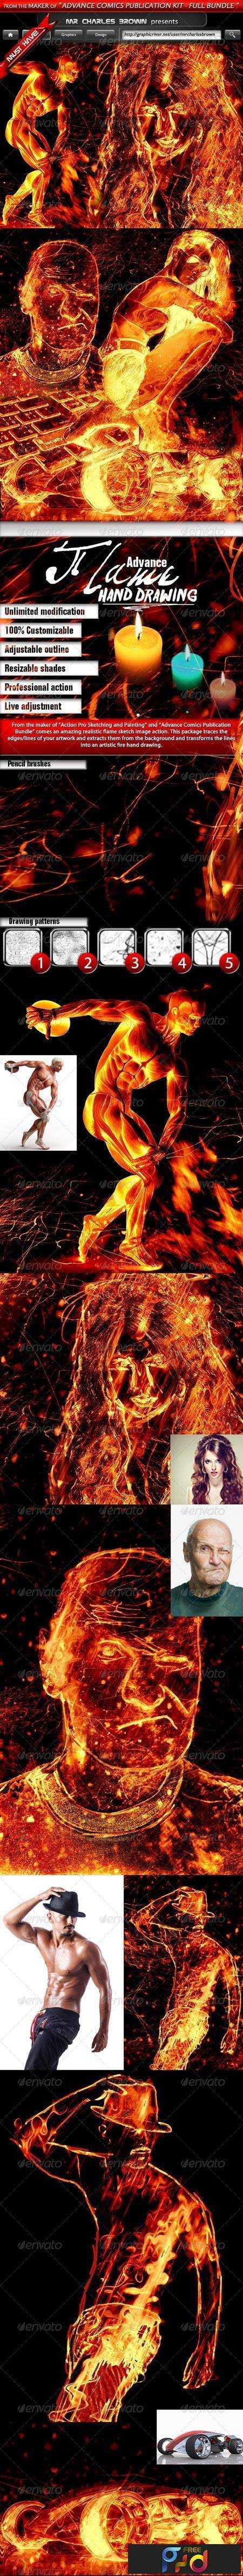 FreePsdVn.com_1702100_PHOTOSHOP_advance_flame_hand_drawing_3530631